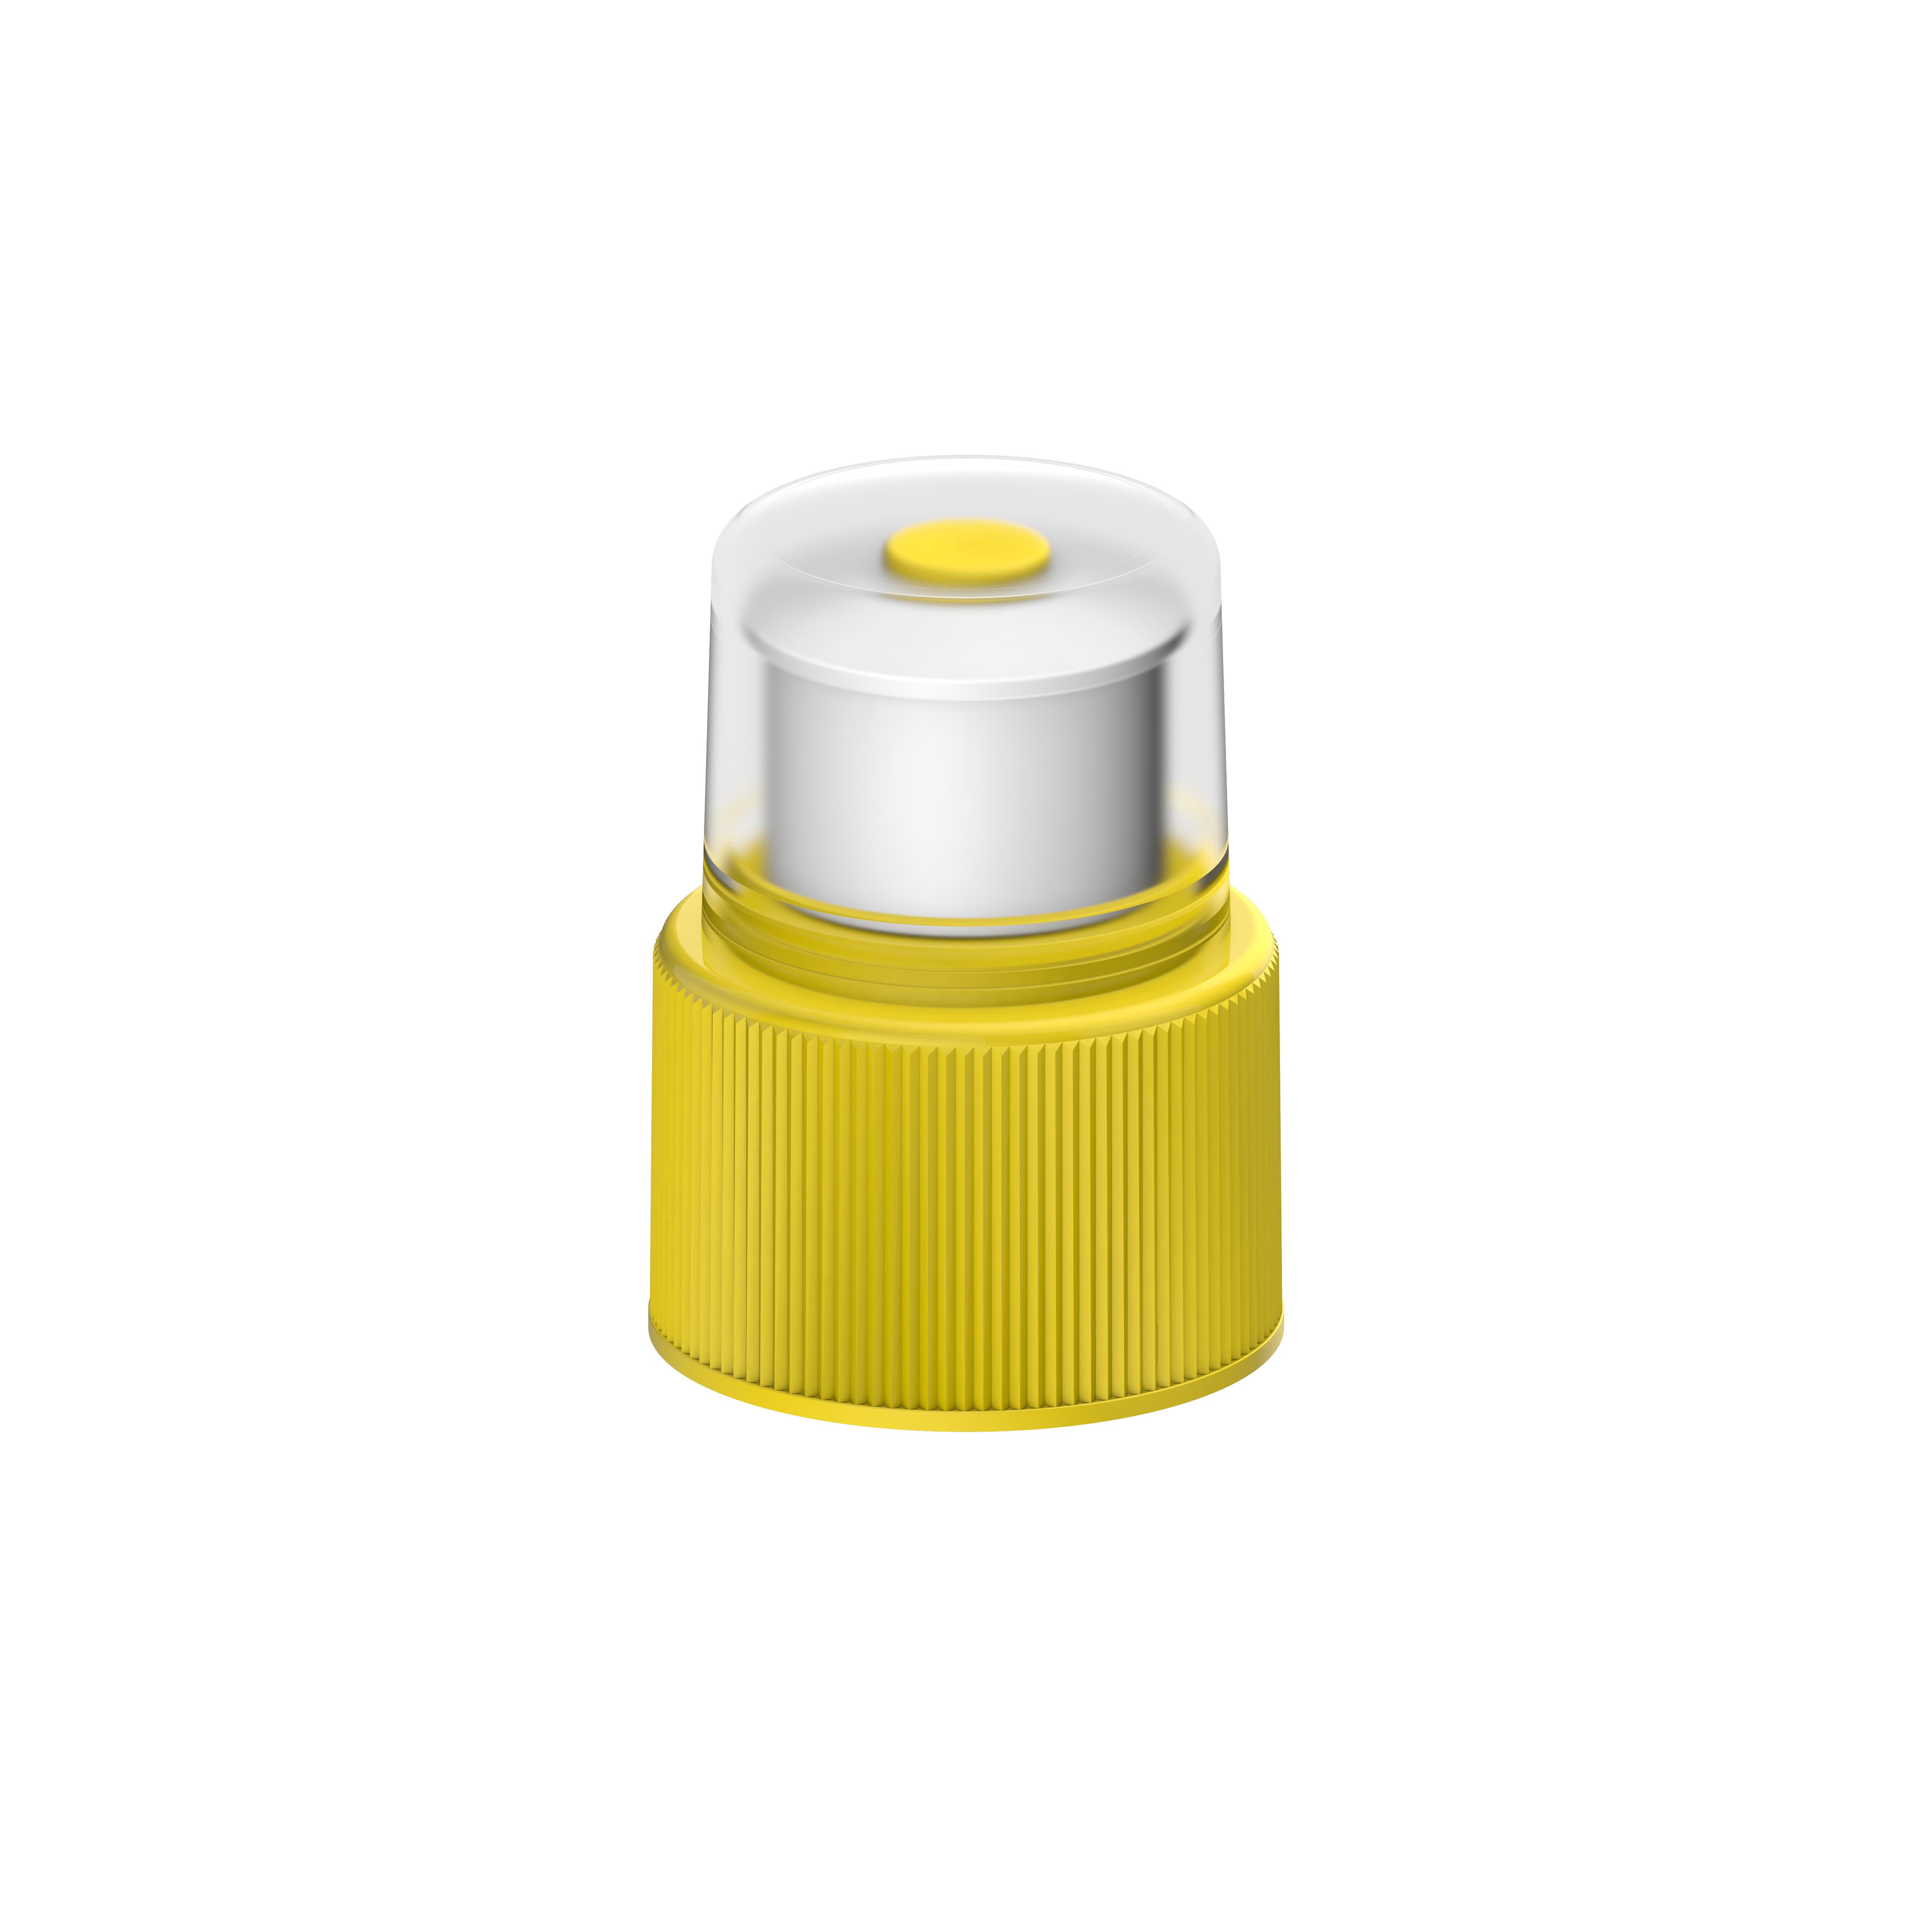 Emil Die Flasche – Trink Caps, lose